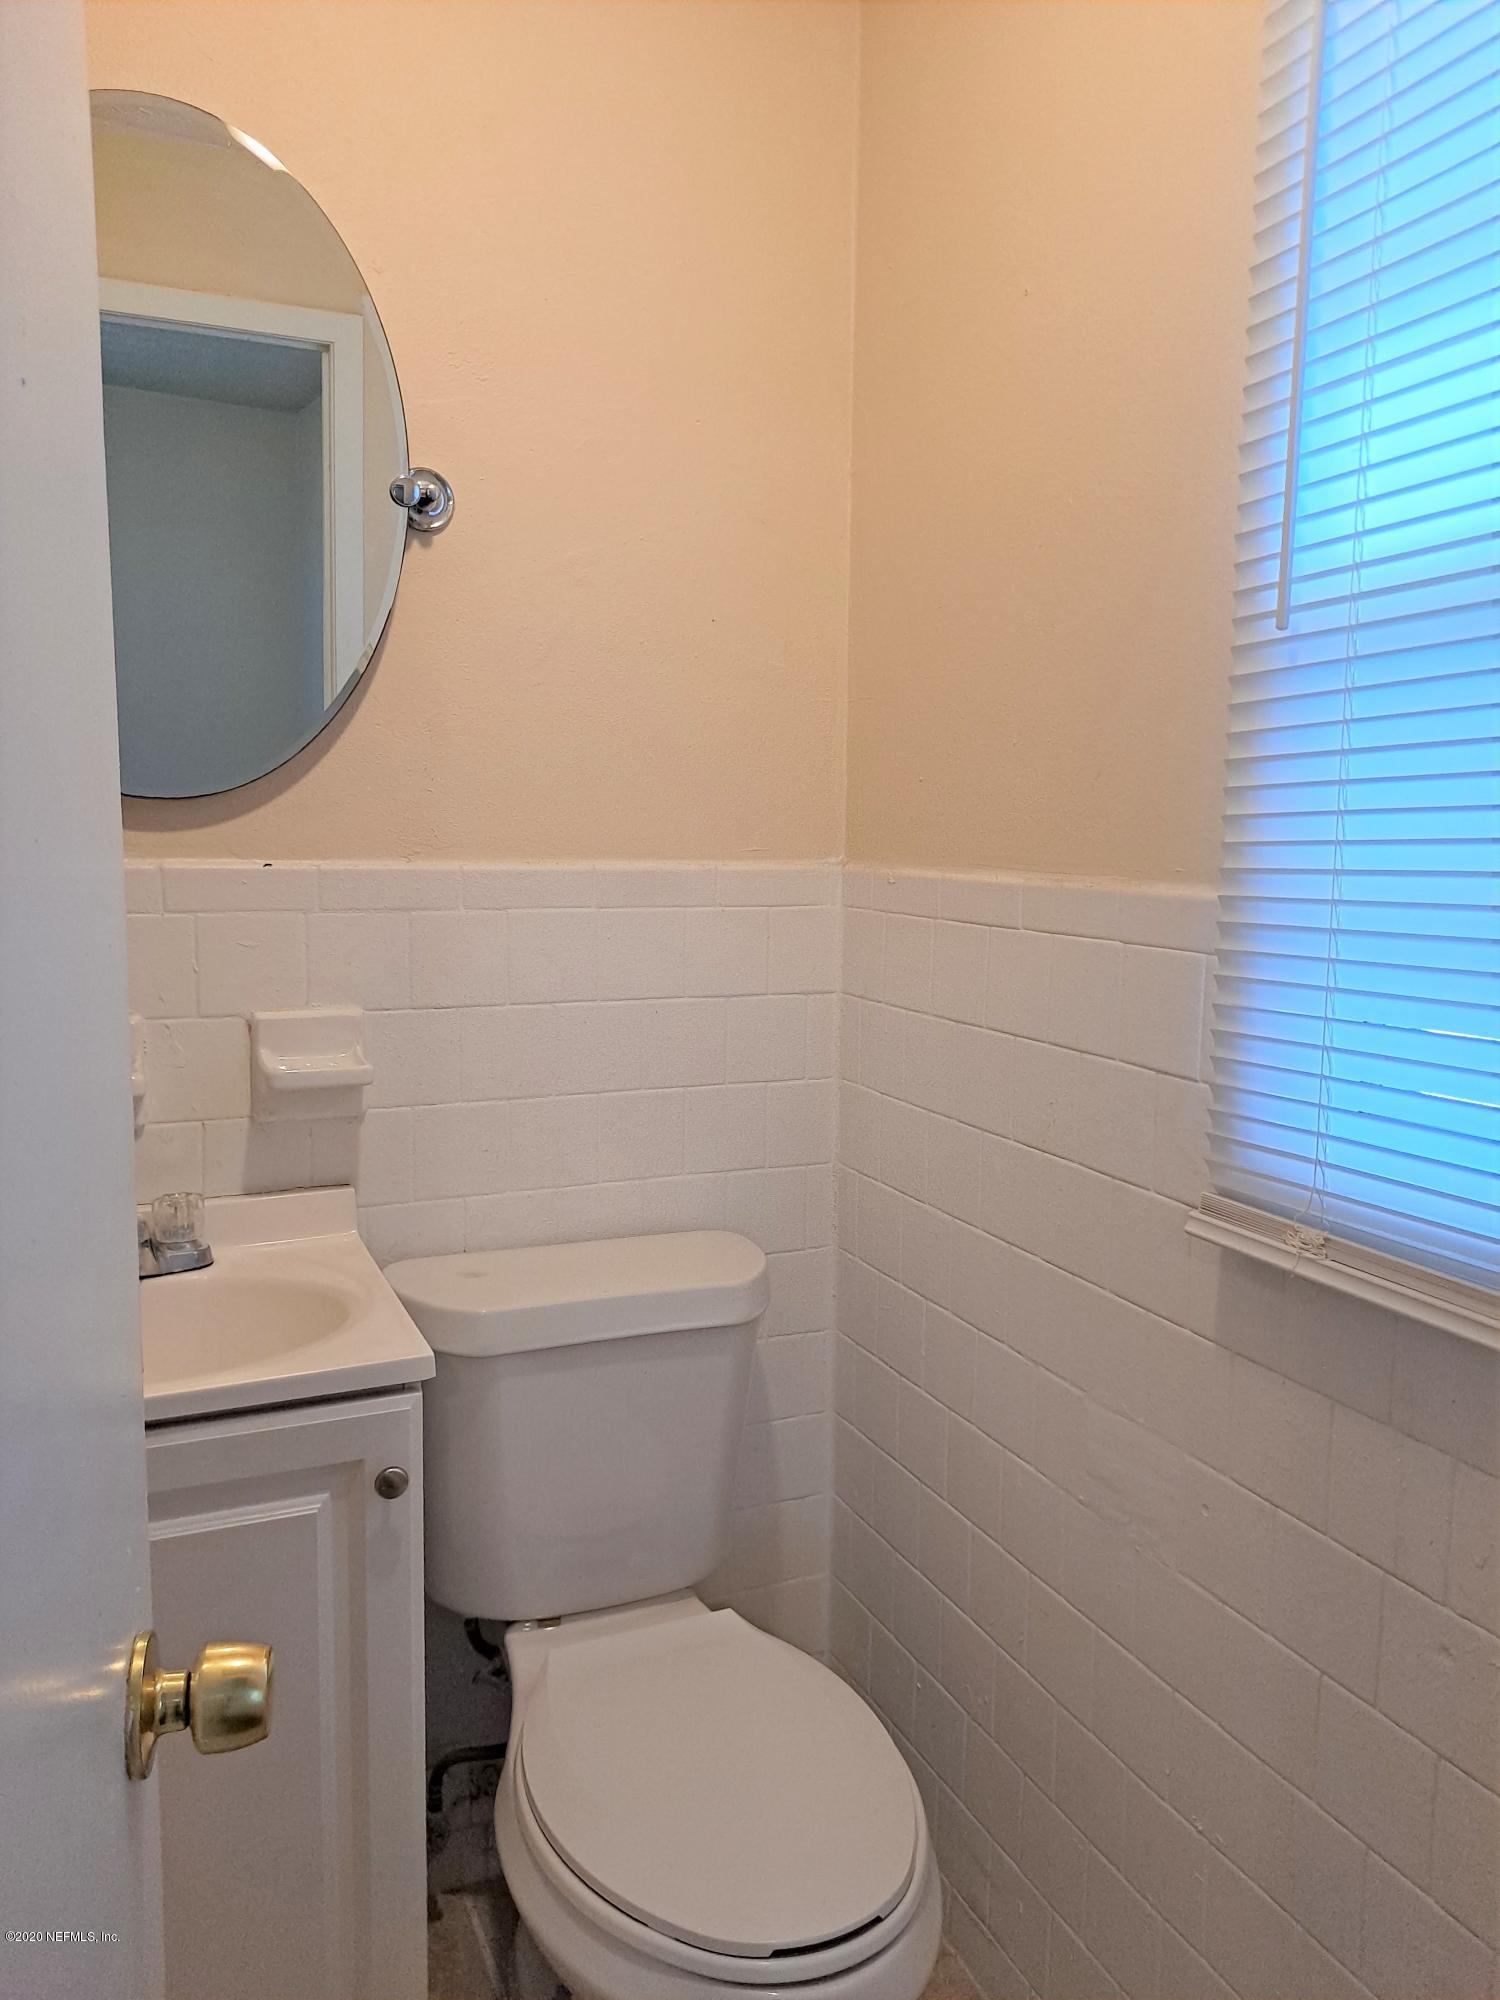 6013 EDGEFIELD, JACKSONVILLE, FLORIDA 32205, 3 Bedrooms Bedrooms, ,2 BathroomsBathrooms,Residential,For sale,EDGEFIELD,1070751